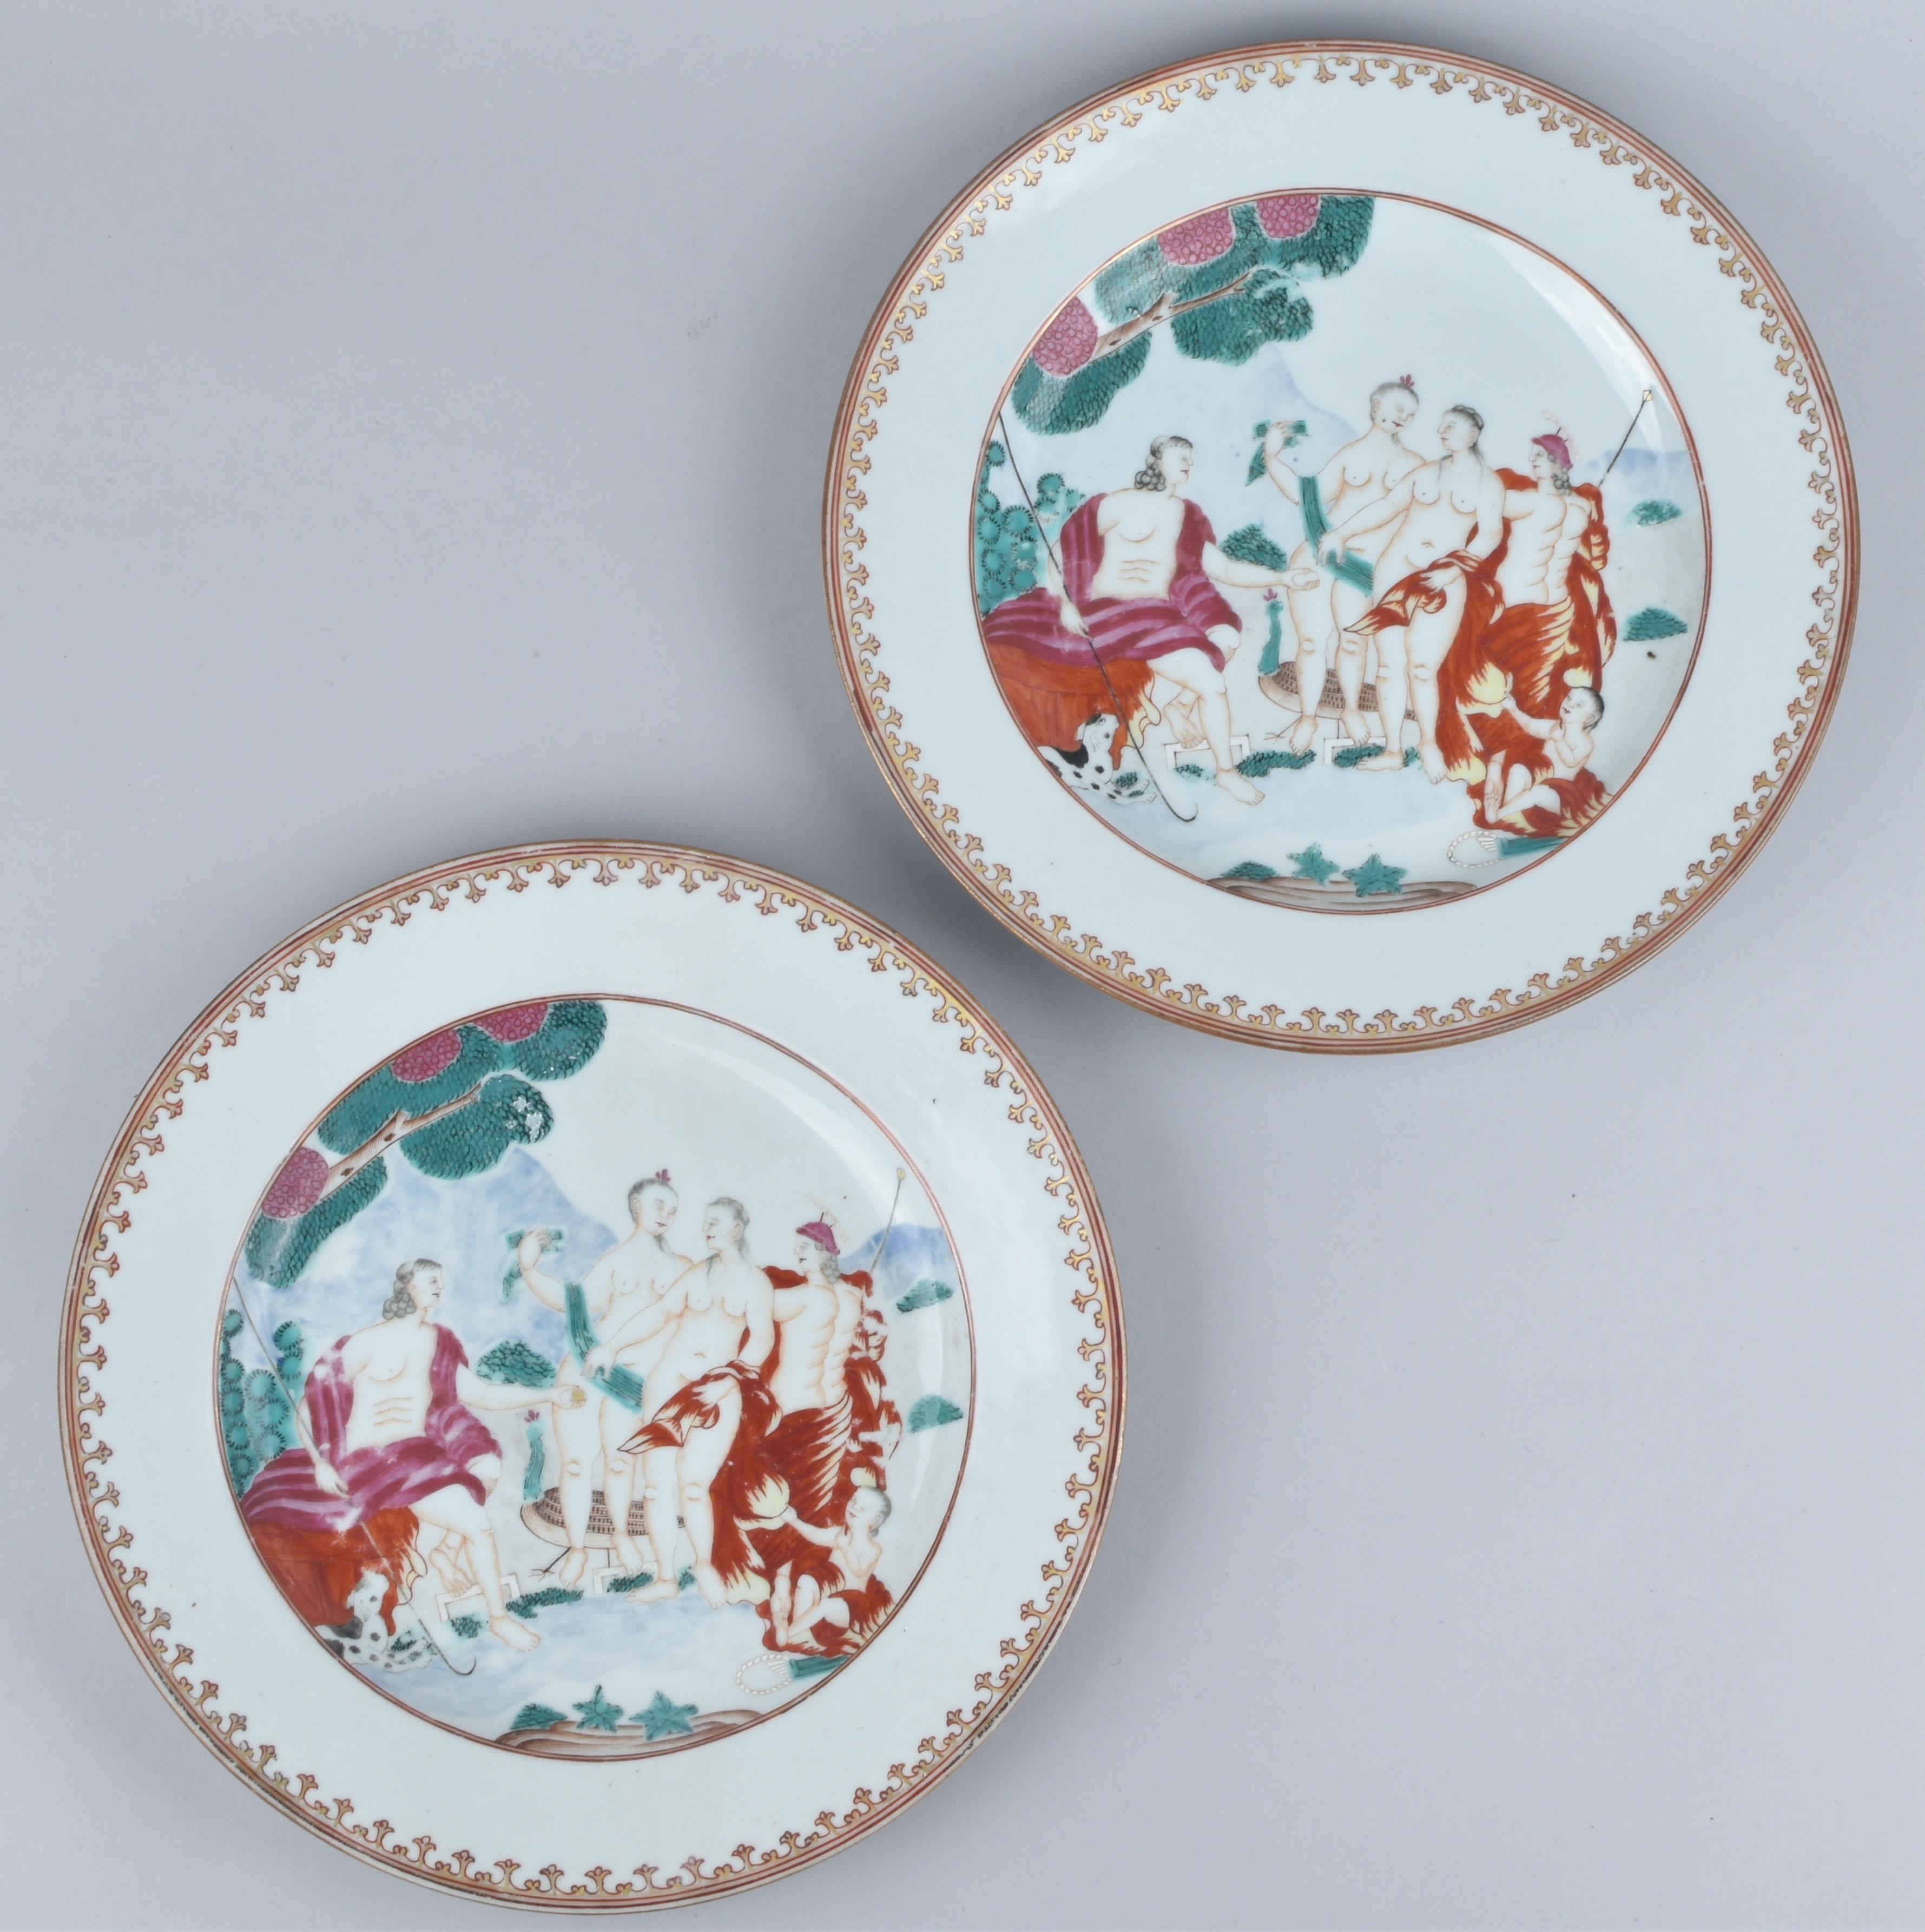 Porcelaine (biscuit) Qianlong (1735-1795), circa 1750/1760, China